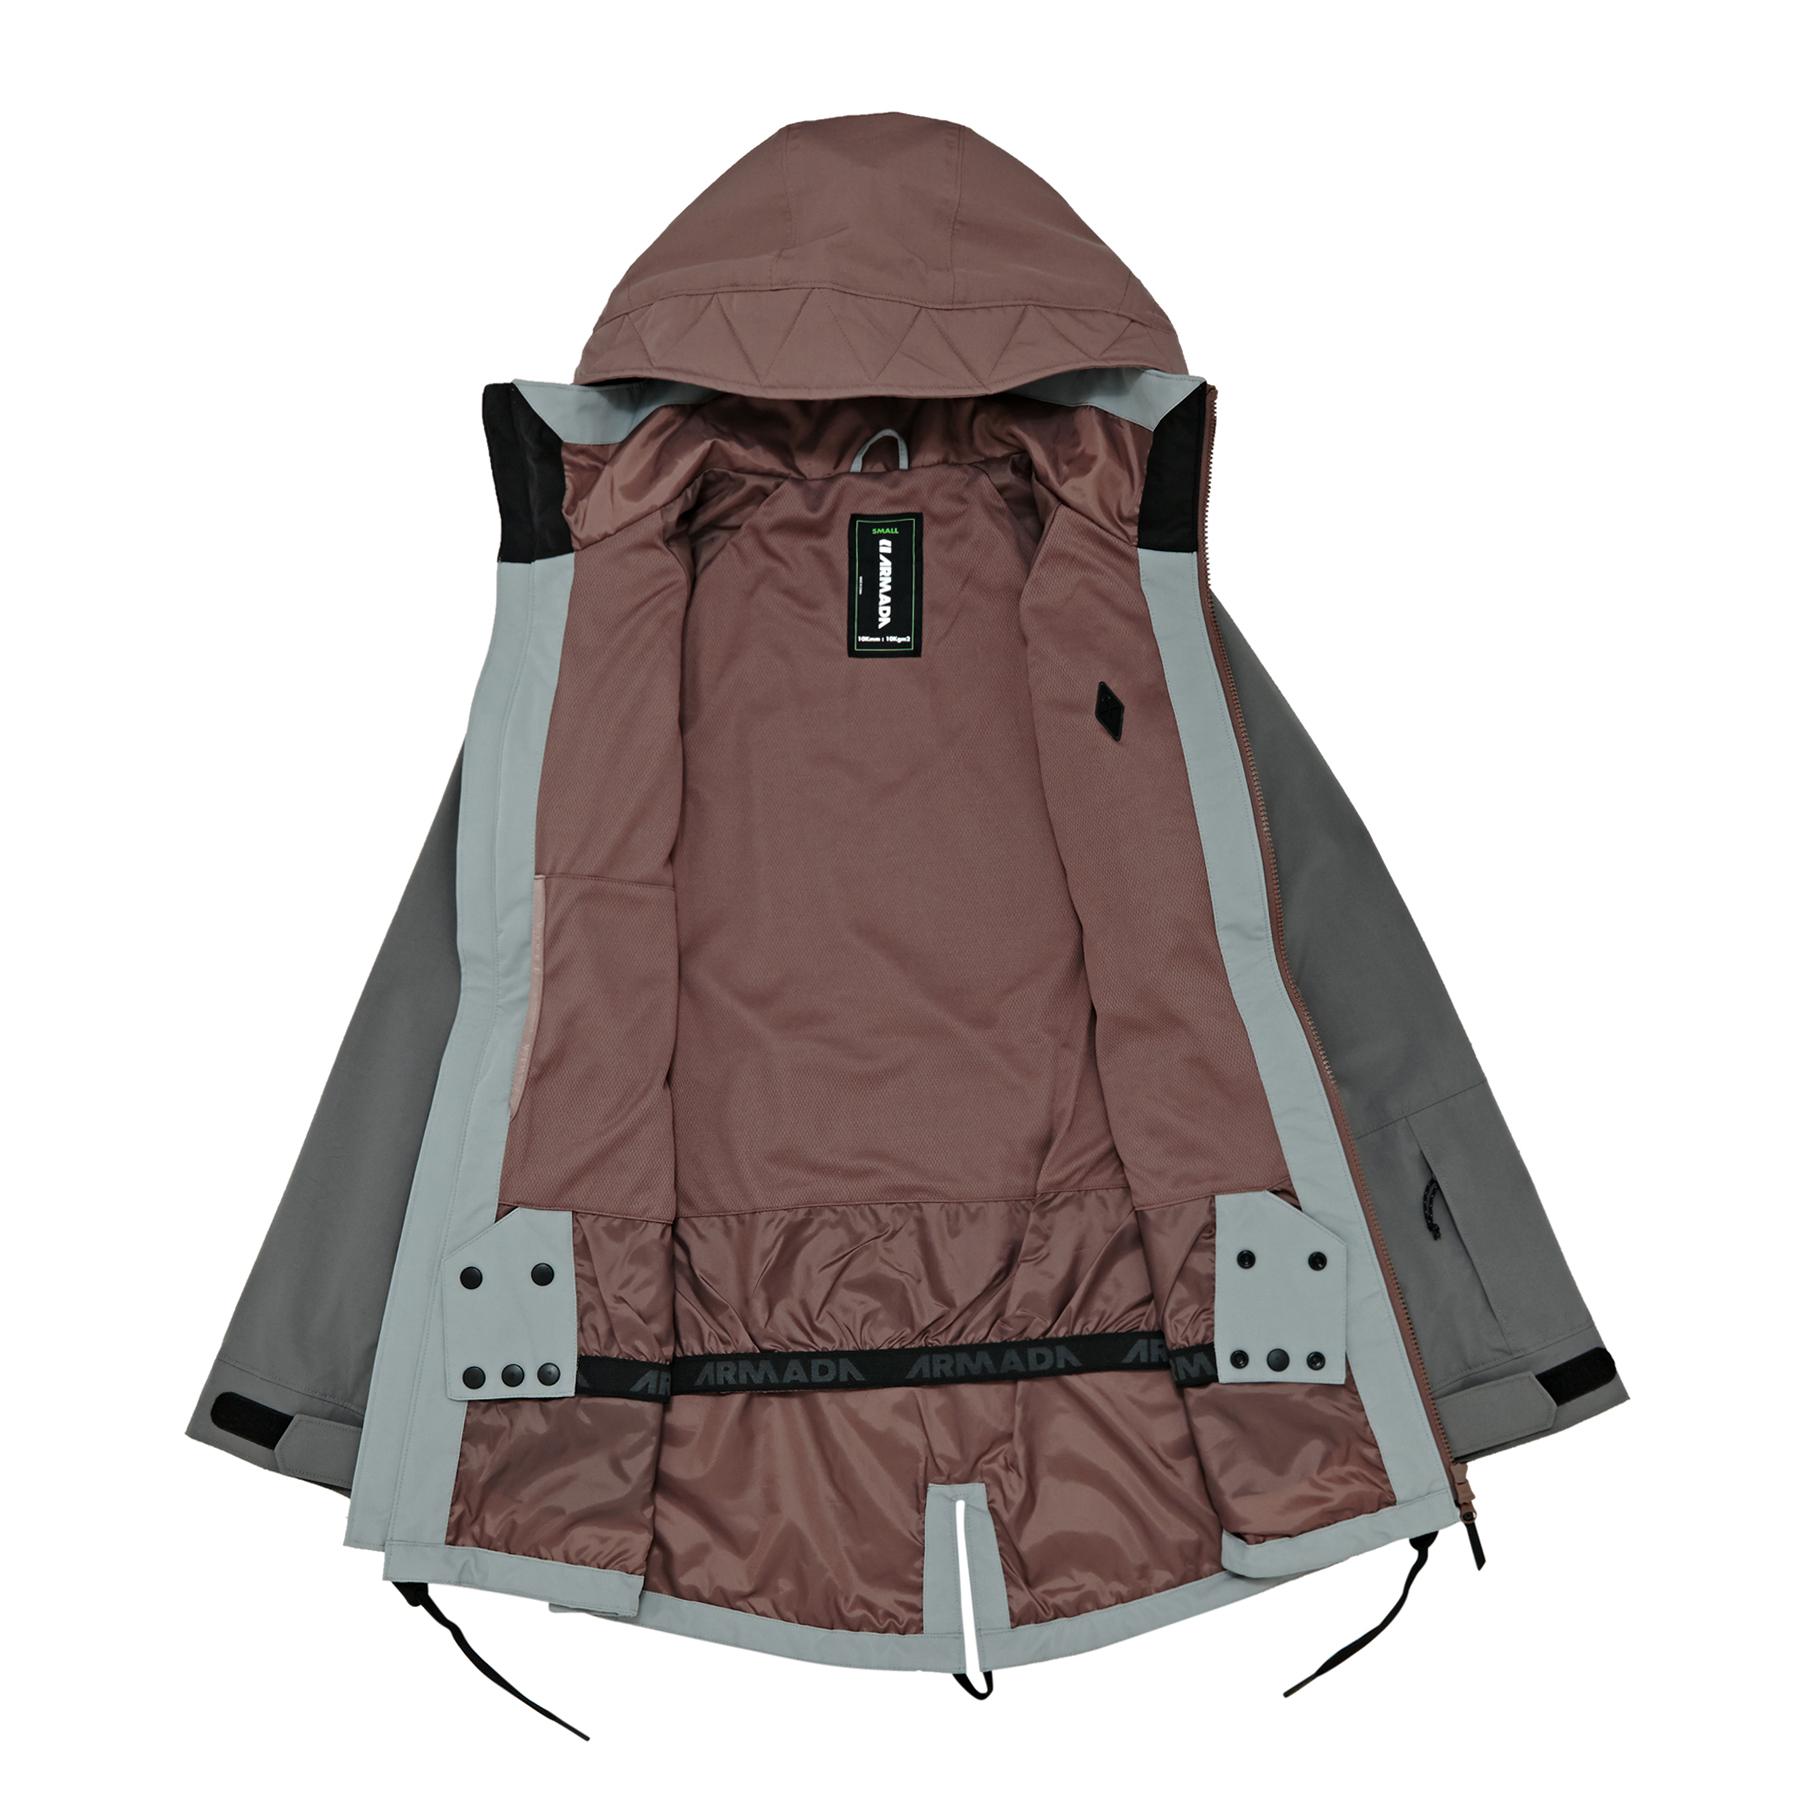 Armada Gypsum Damen Snowboard Jacke Free Delivery options